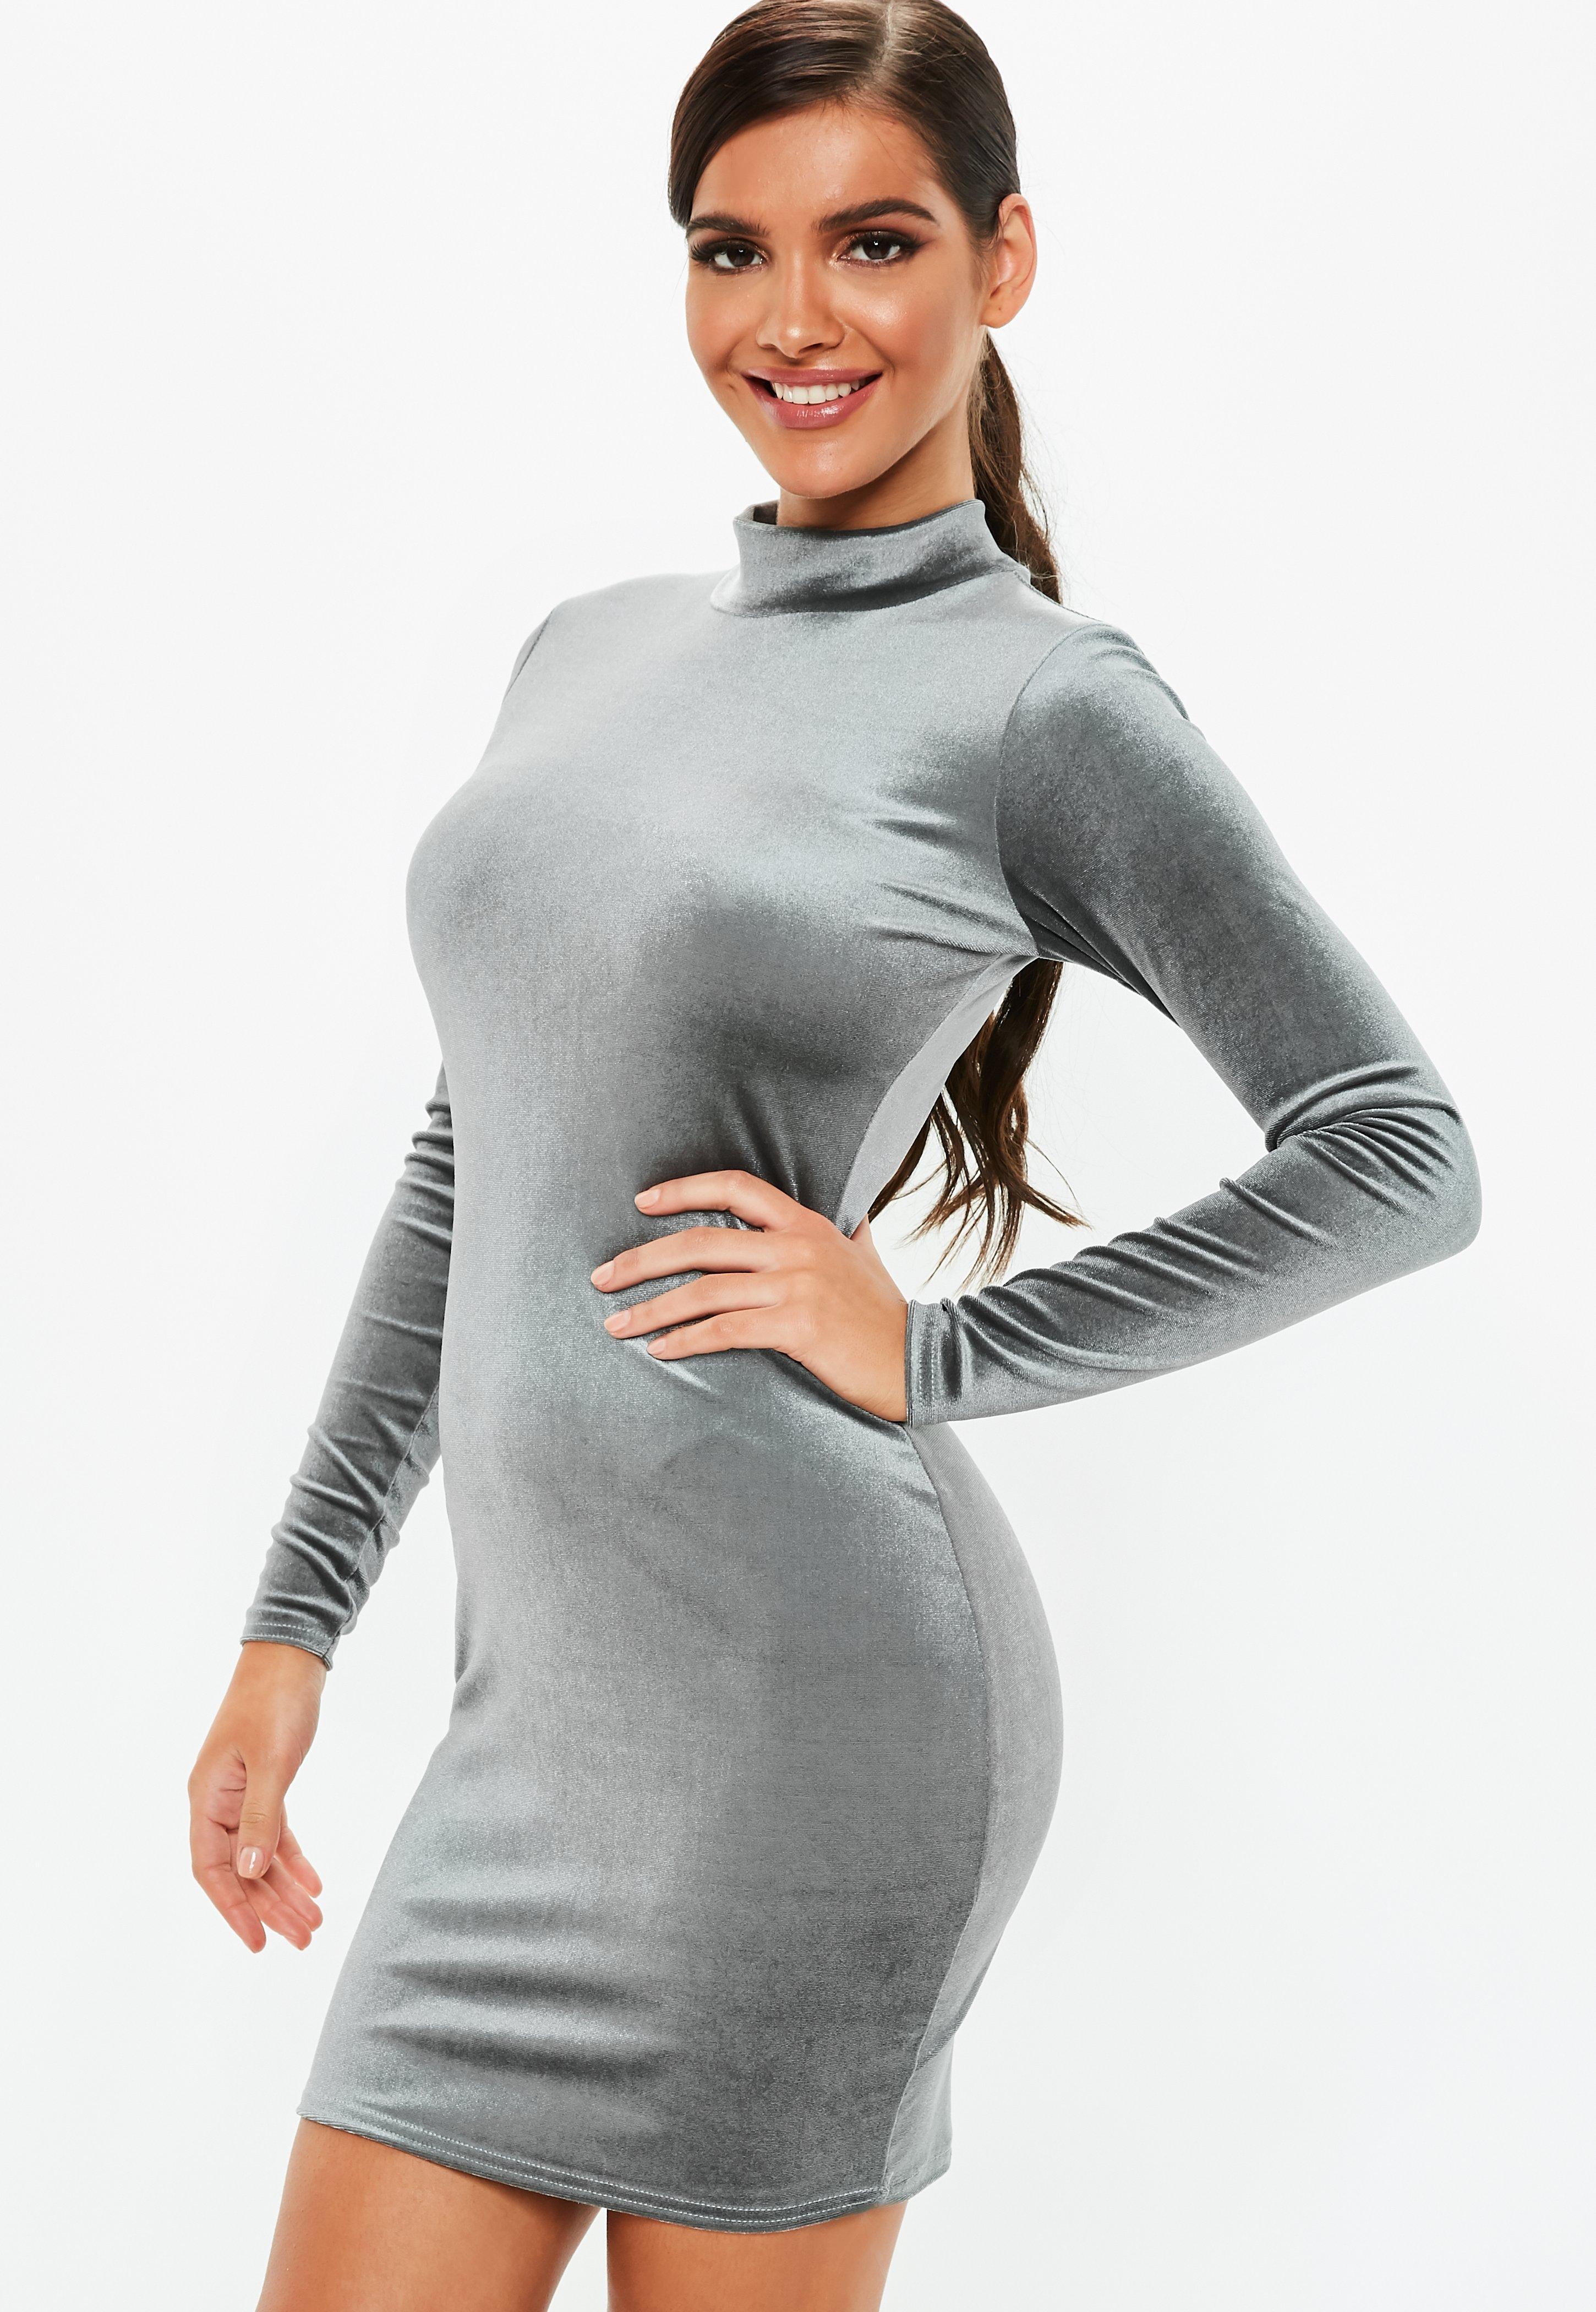 5679e8a42b Sukienki Welurowe - Damskie Welurowe Sukienki - Missguided